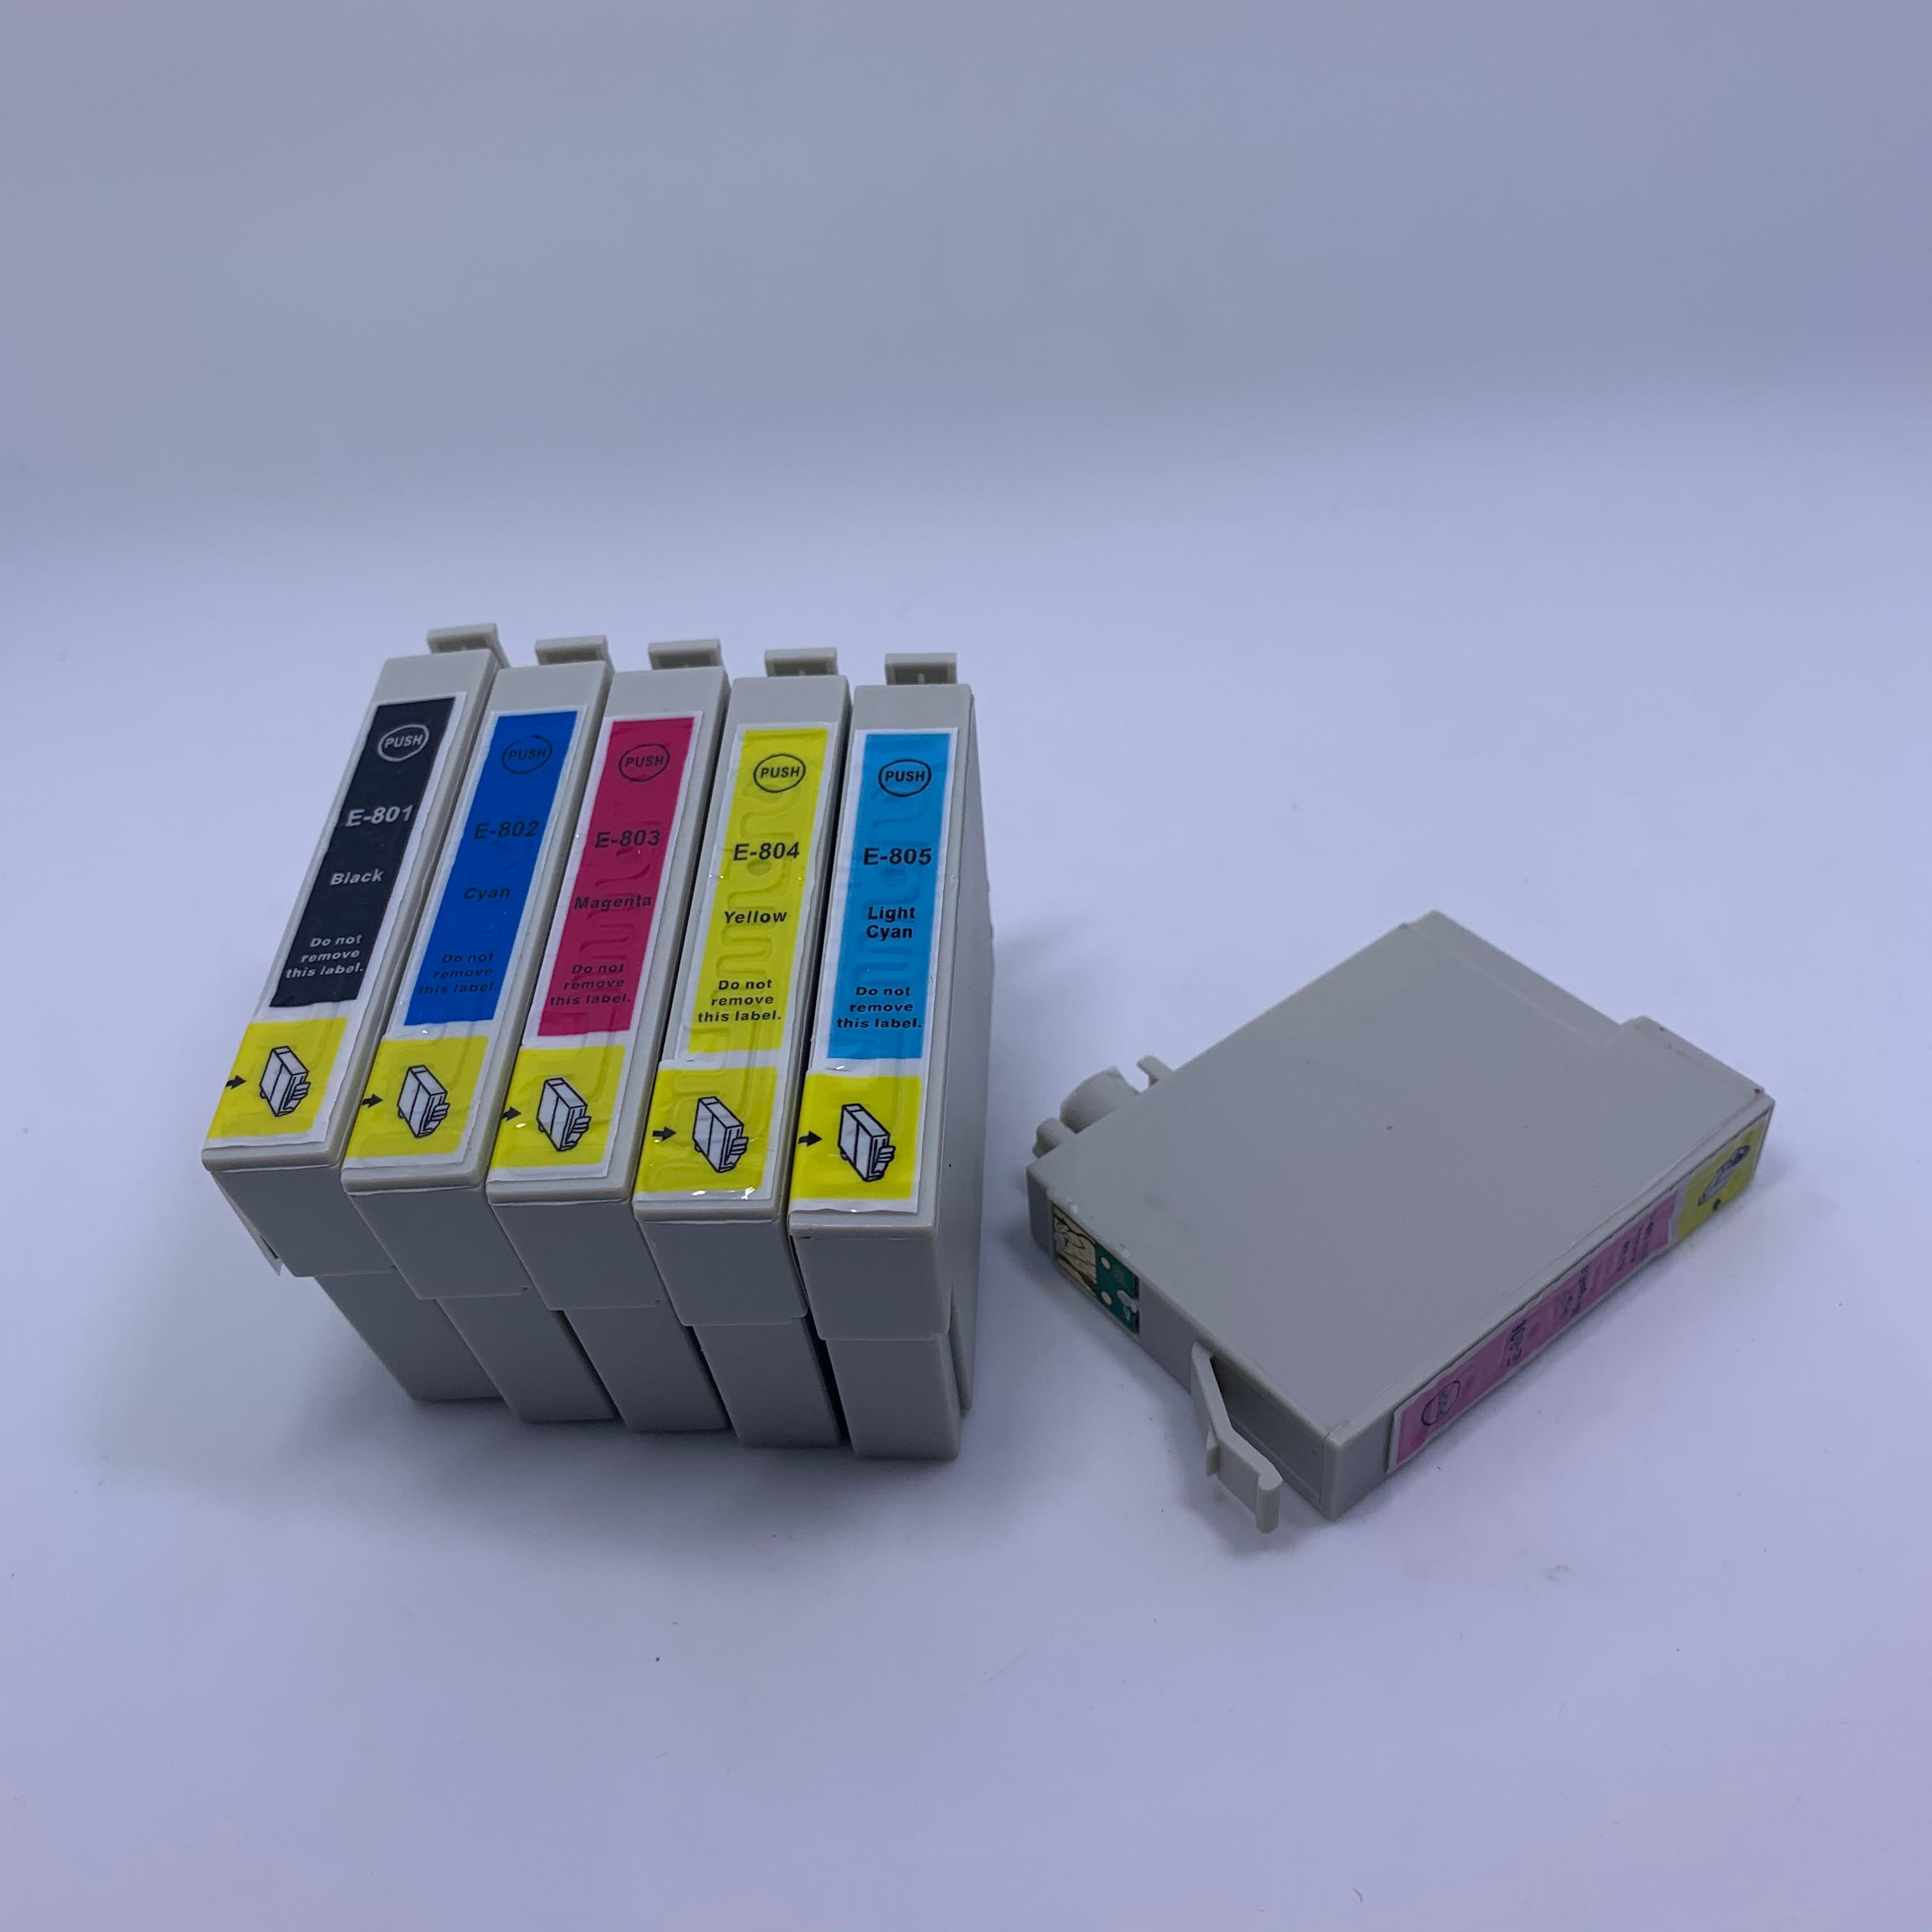 YOTAT Ink Cartridge T0801 T0802 T0803 T0804 T0805 T0806 For Epson Stylus Photo R265/R285/R360/RX560/RX585/RX685/ P50